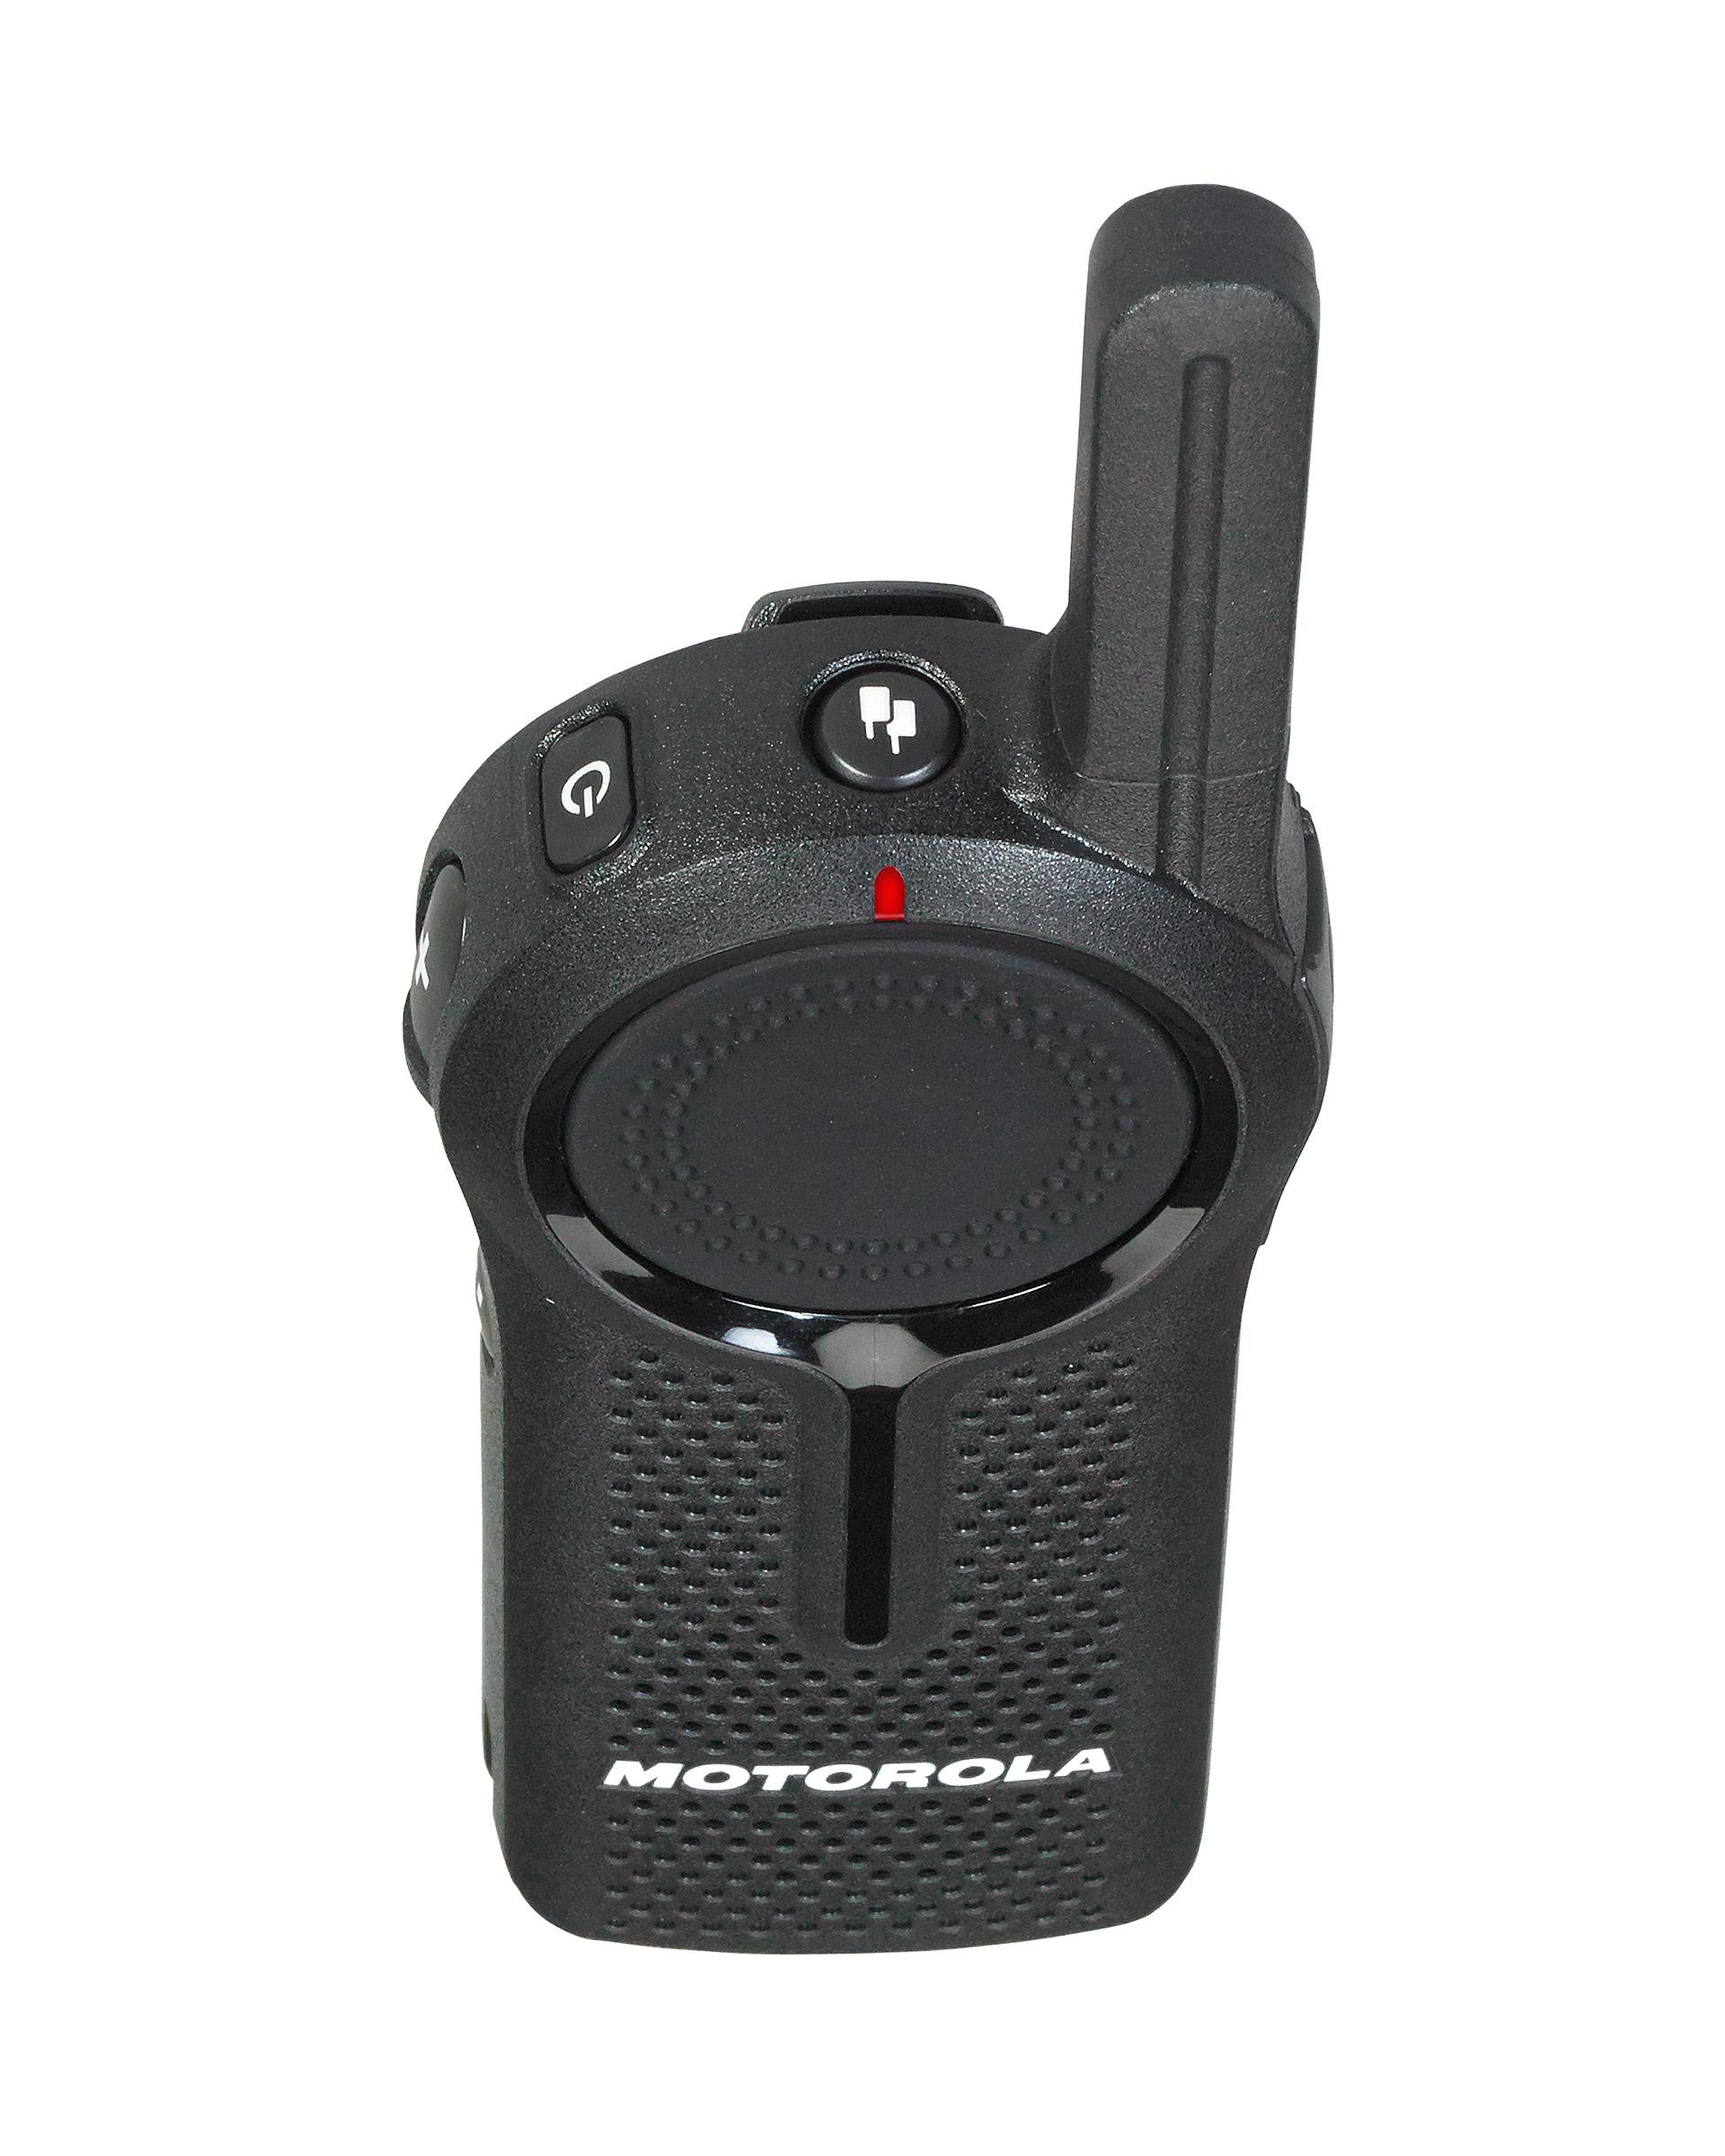 6 Motorola DLR1060 Digital Two Way Radios With HKLN4604 Headsets